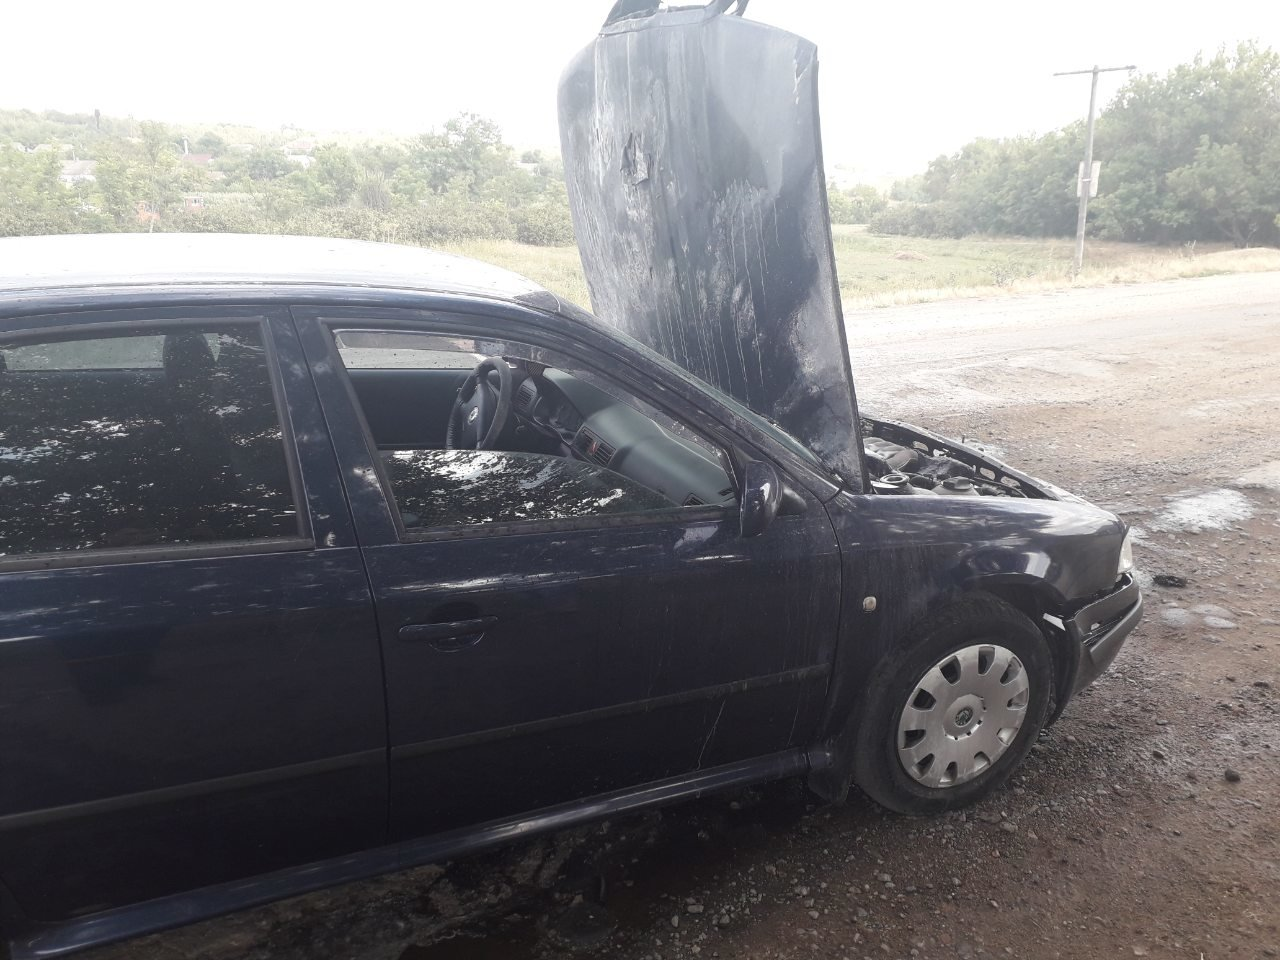 На Николаевщине спасатели потушили пожар автомобиля, - ФОТО, фото-3